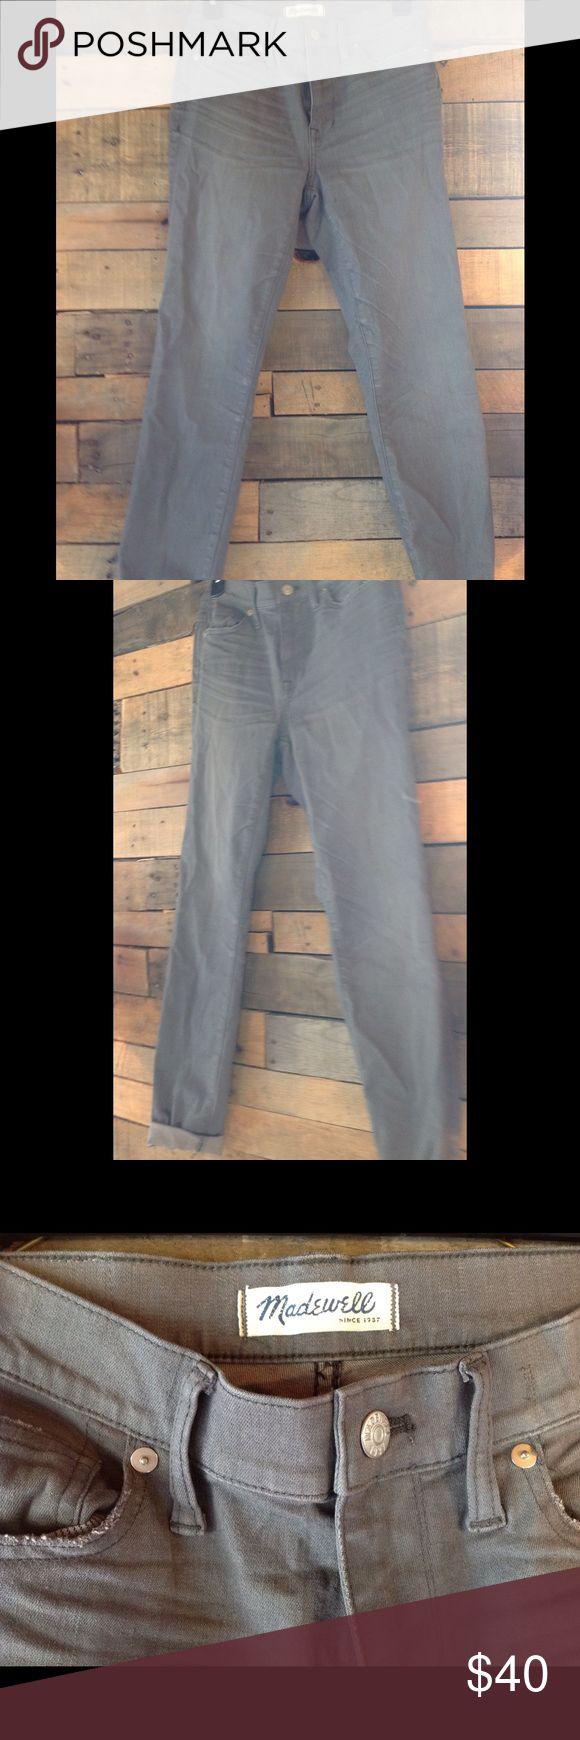 ON SALE: Madewell grey boyfriend jeans Grey Madewell boyfriend fit jeans | Never worn Madewell Jeans Boyfriend